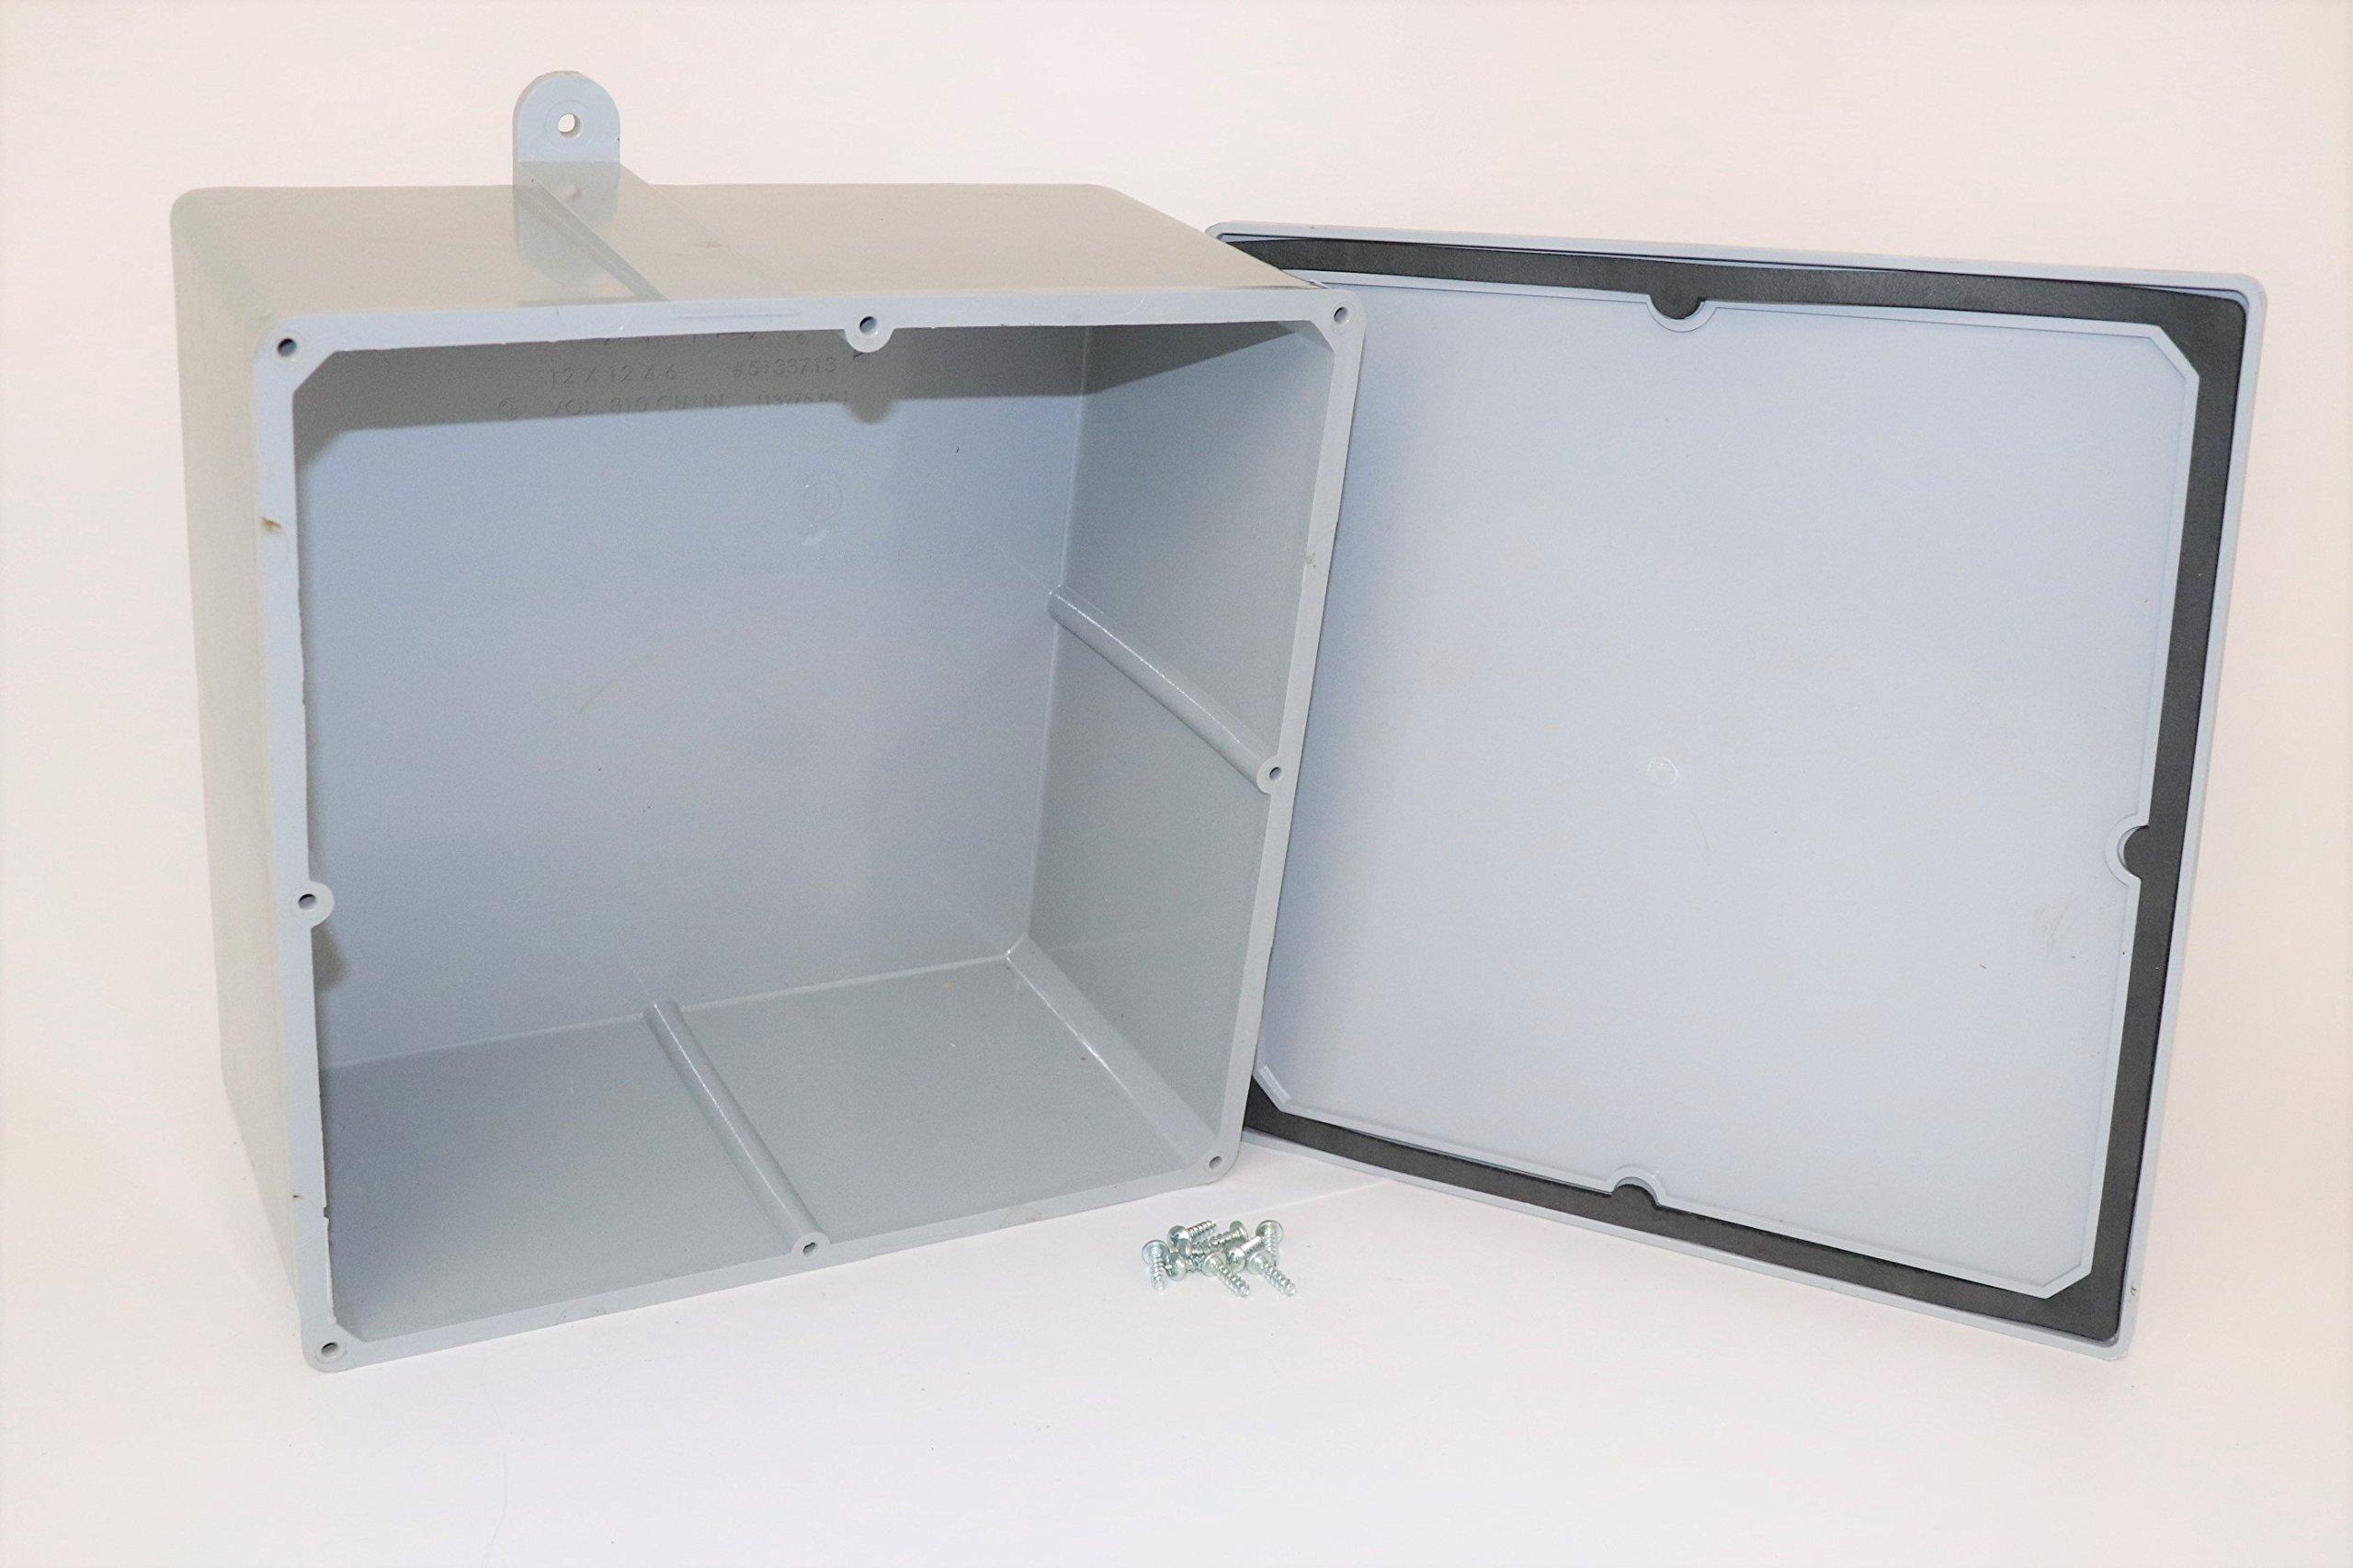 CANTEX Electrical Box PVC 13x13x6-1/4 in.